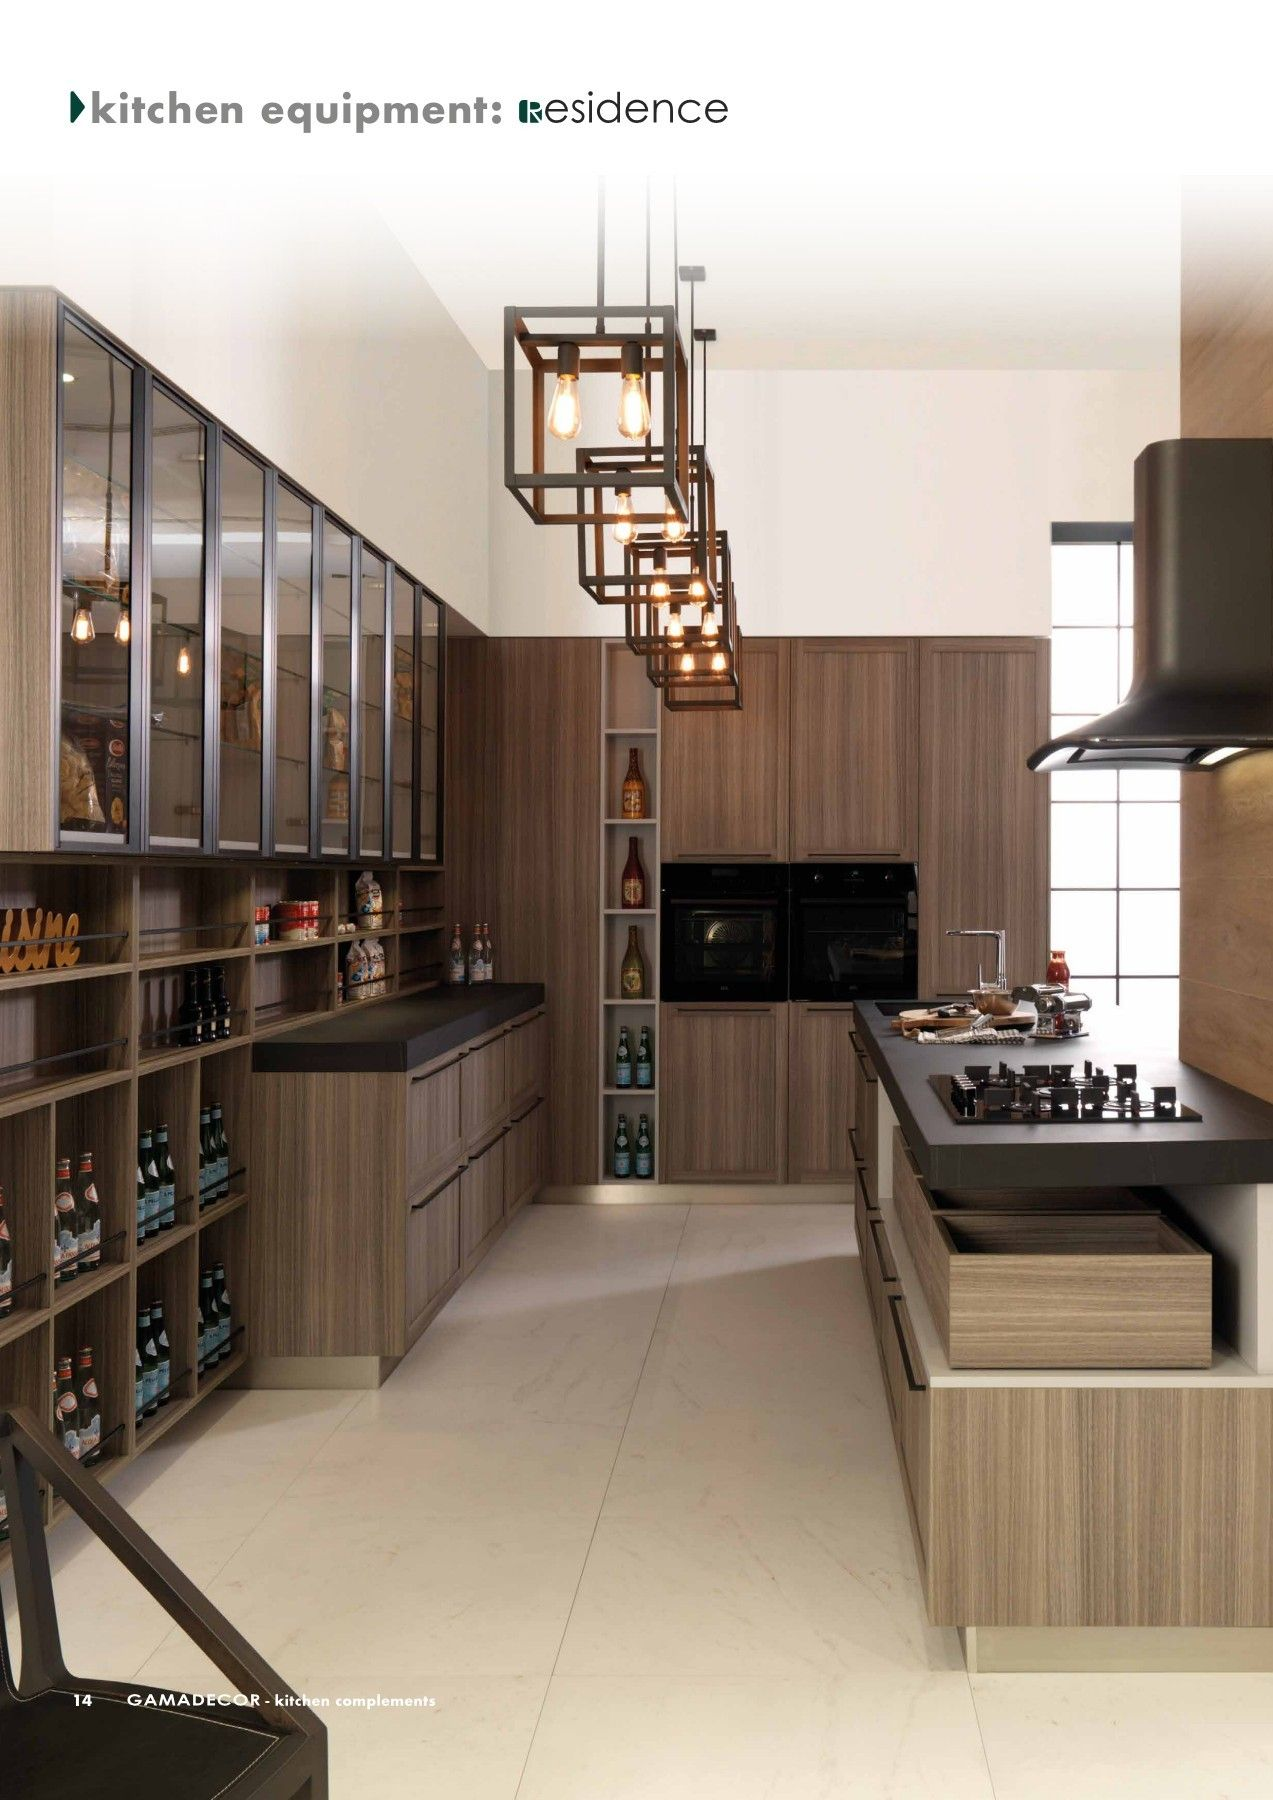 Kitchen Equipment Kitchen Equipment Kitchen Kitchen Cabinets